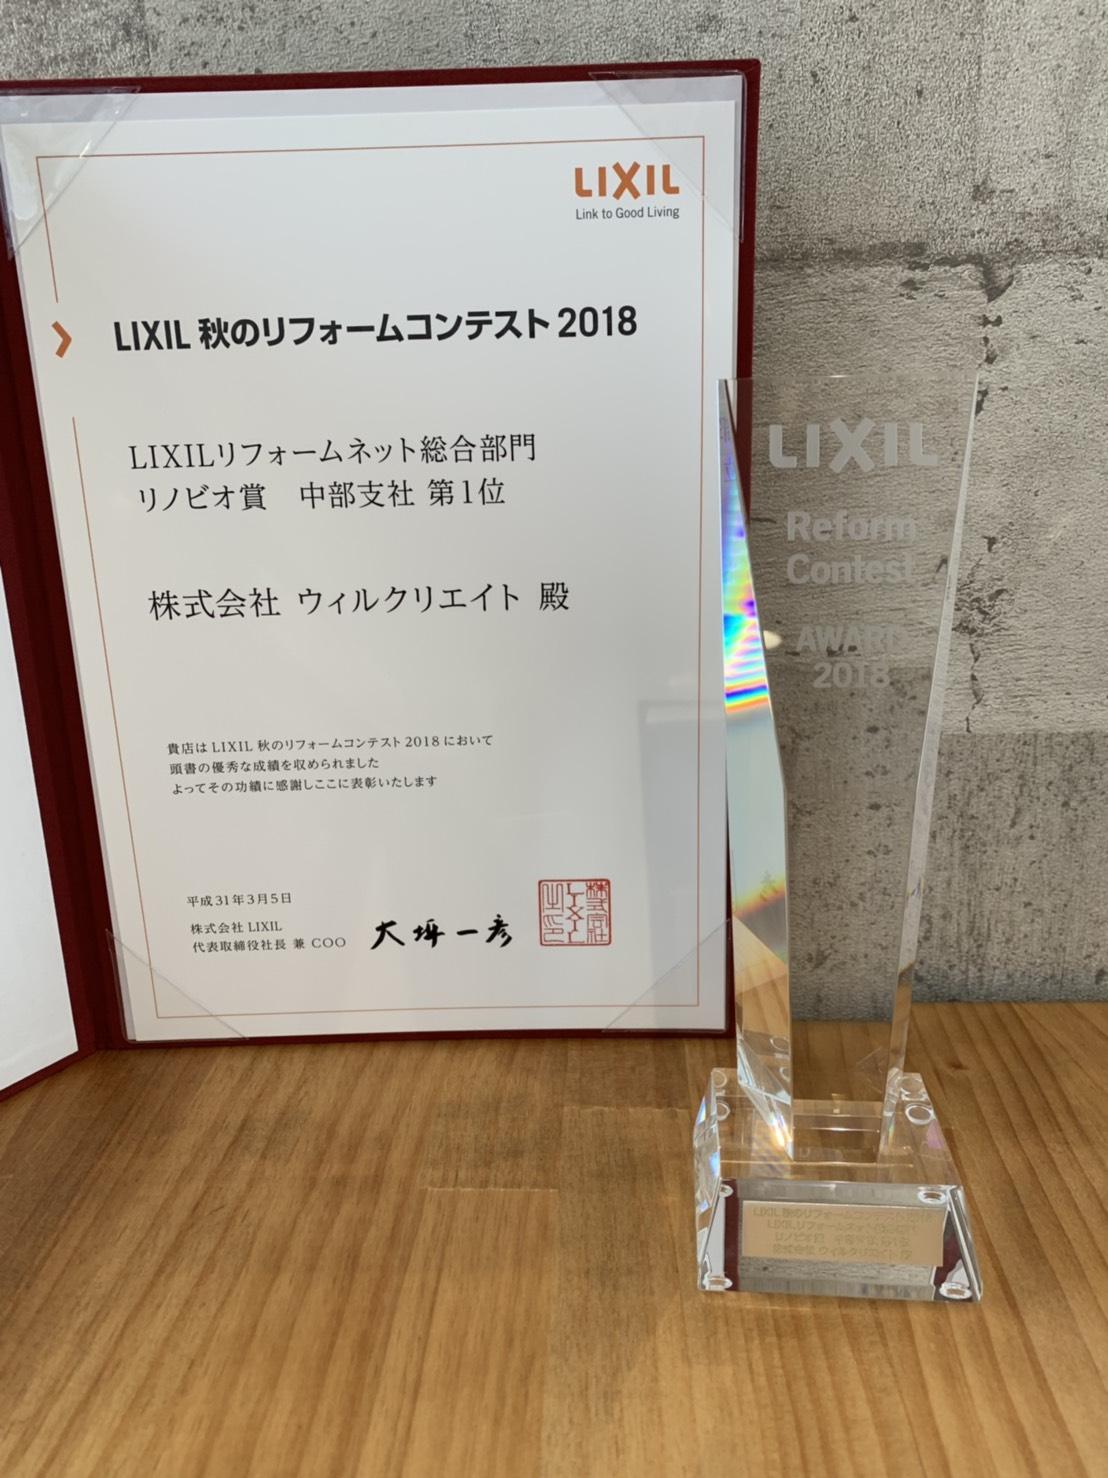 LXIL リフォームコンテスト受賞